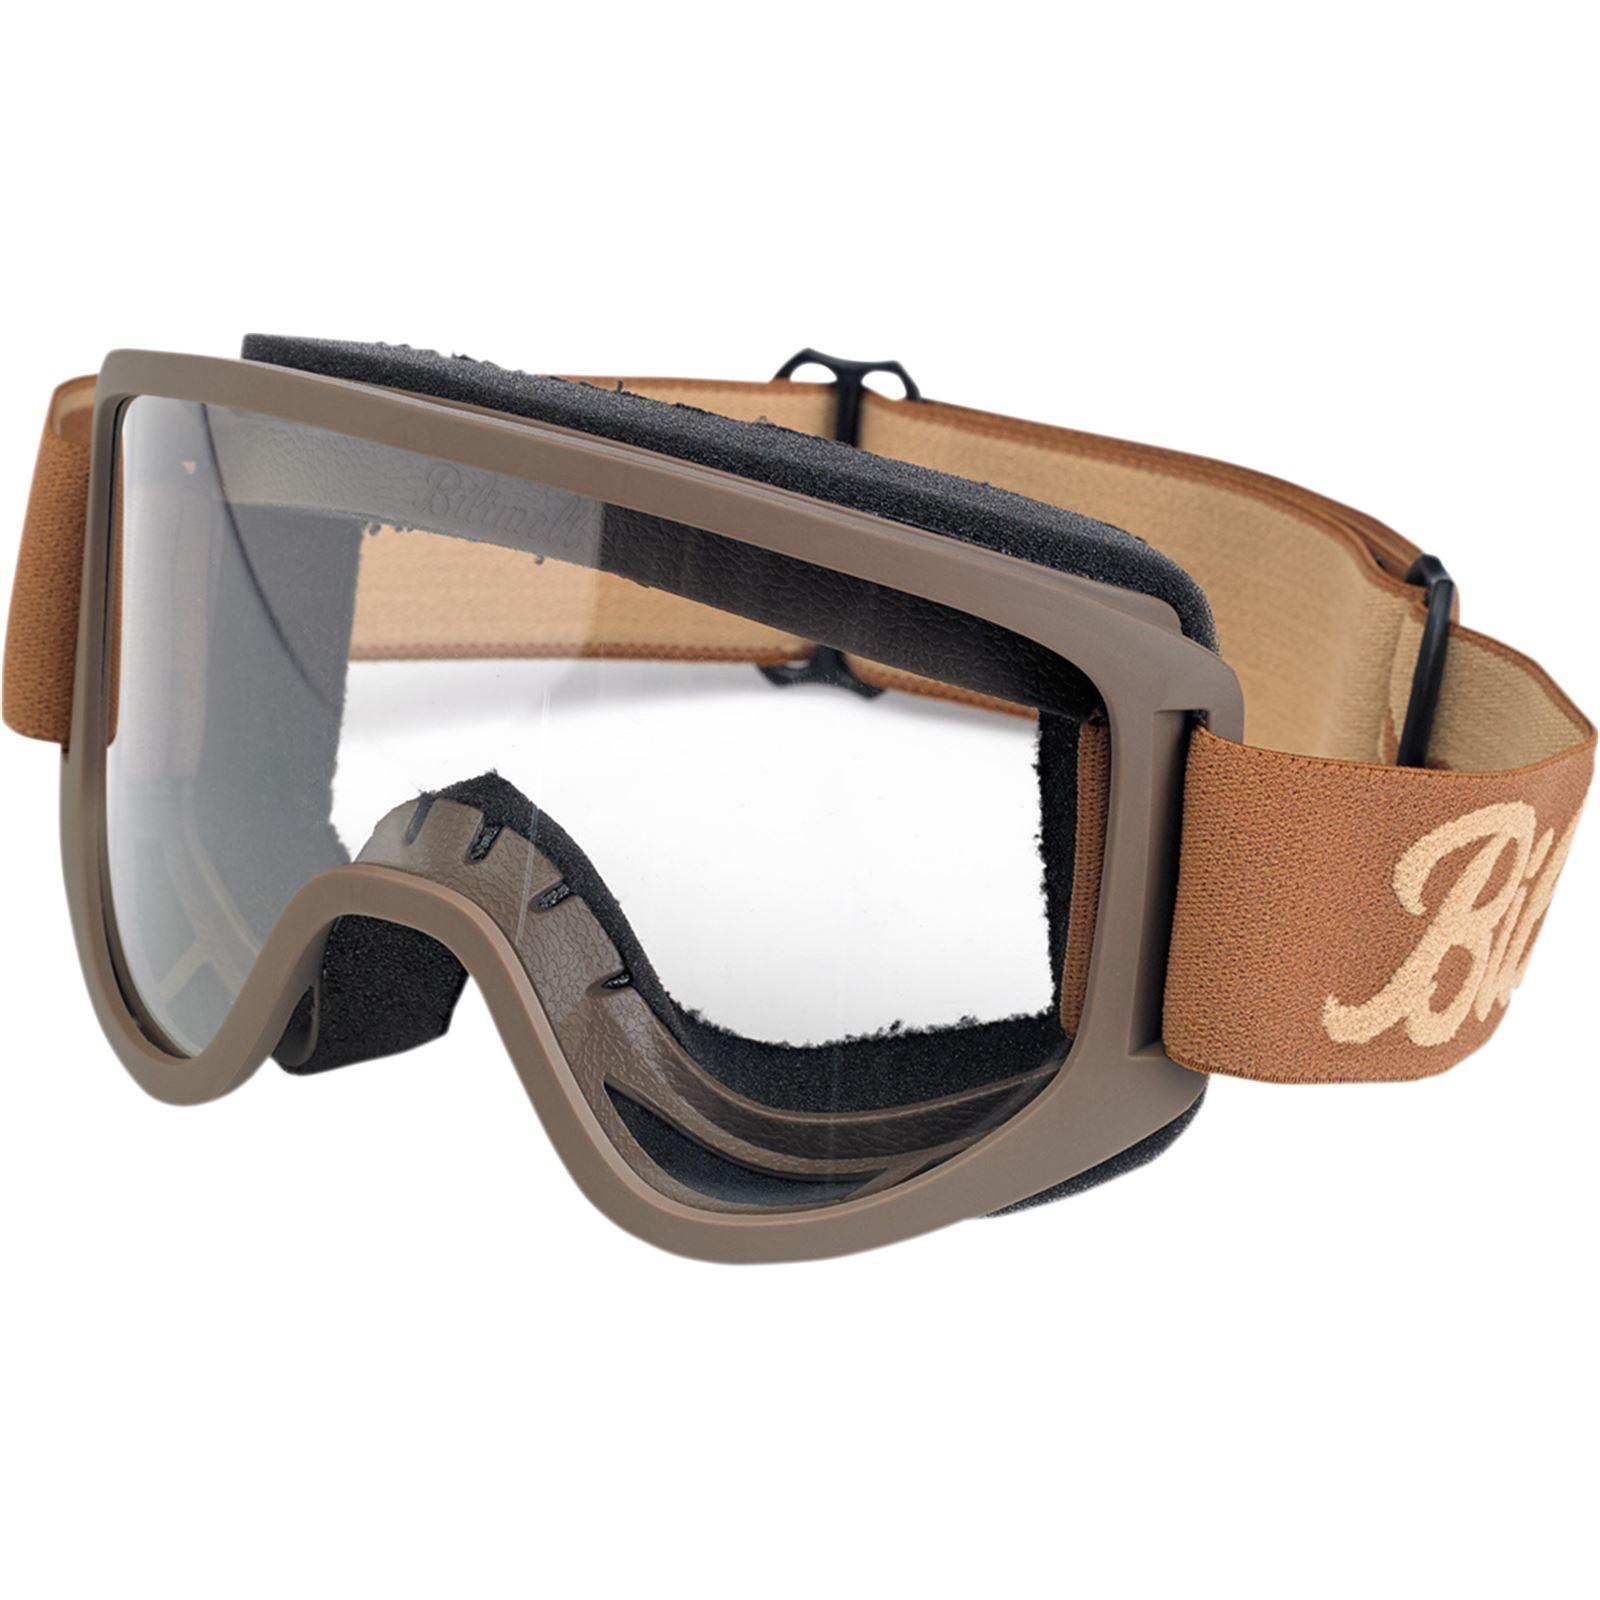 Biltwell Inc. Moto 2.0 Goggles - Chocolate/Sand